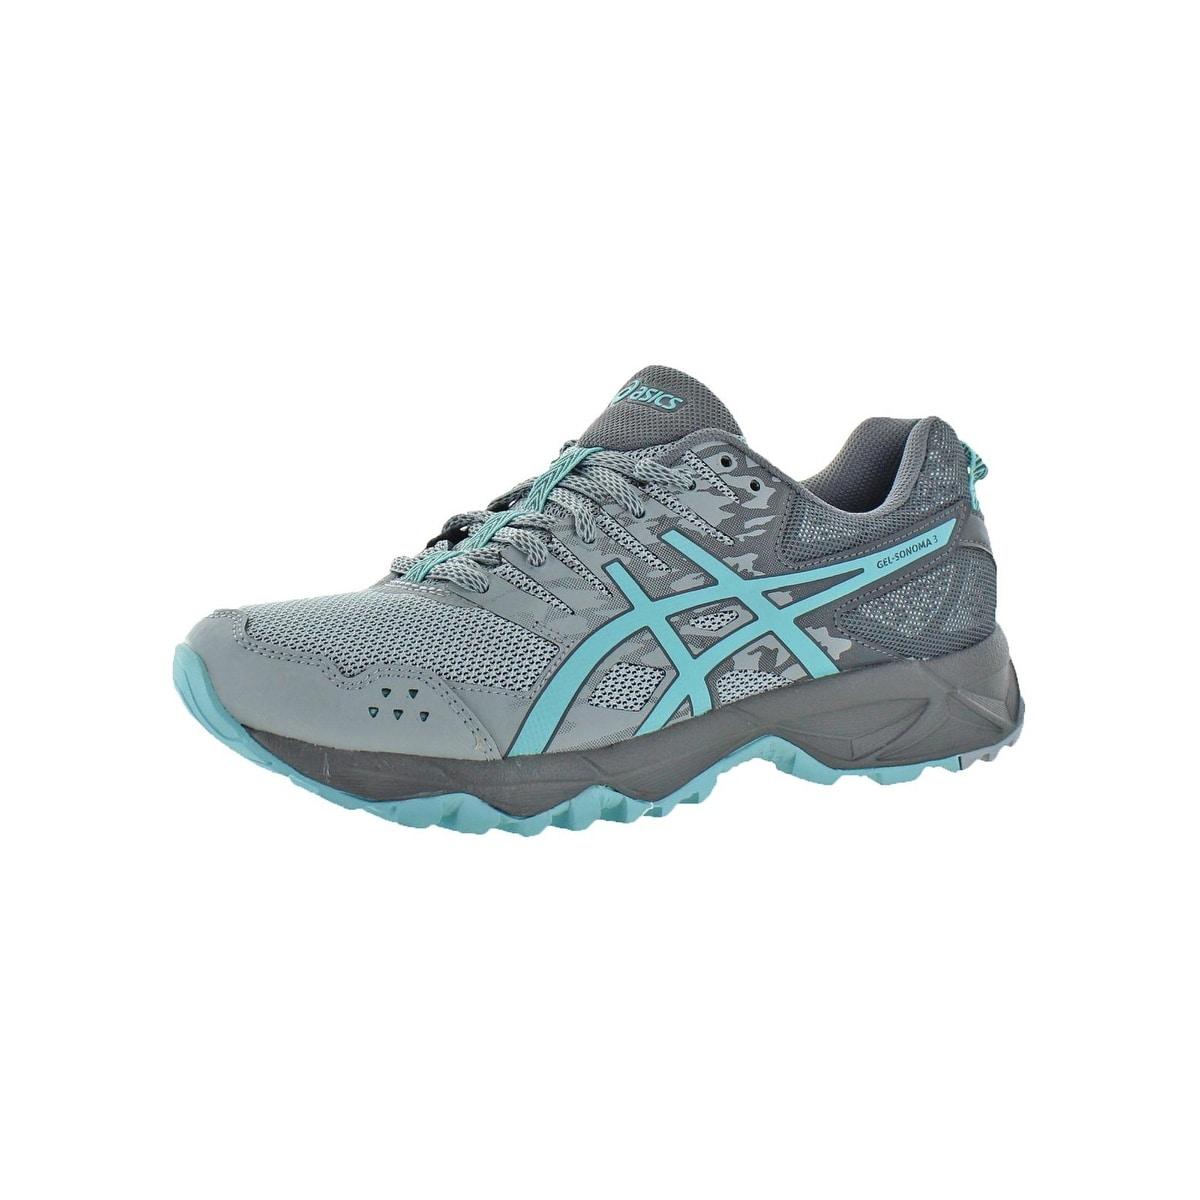 cortar Economía sitio  ASICS GEL-Sonoma 3 Athletic Running Trail Shoes Navy Womens